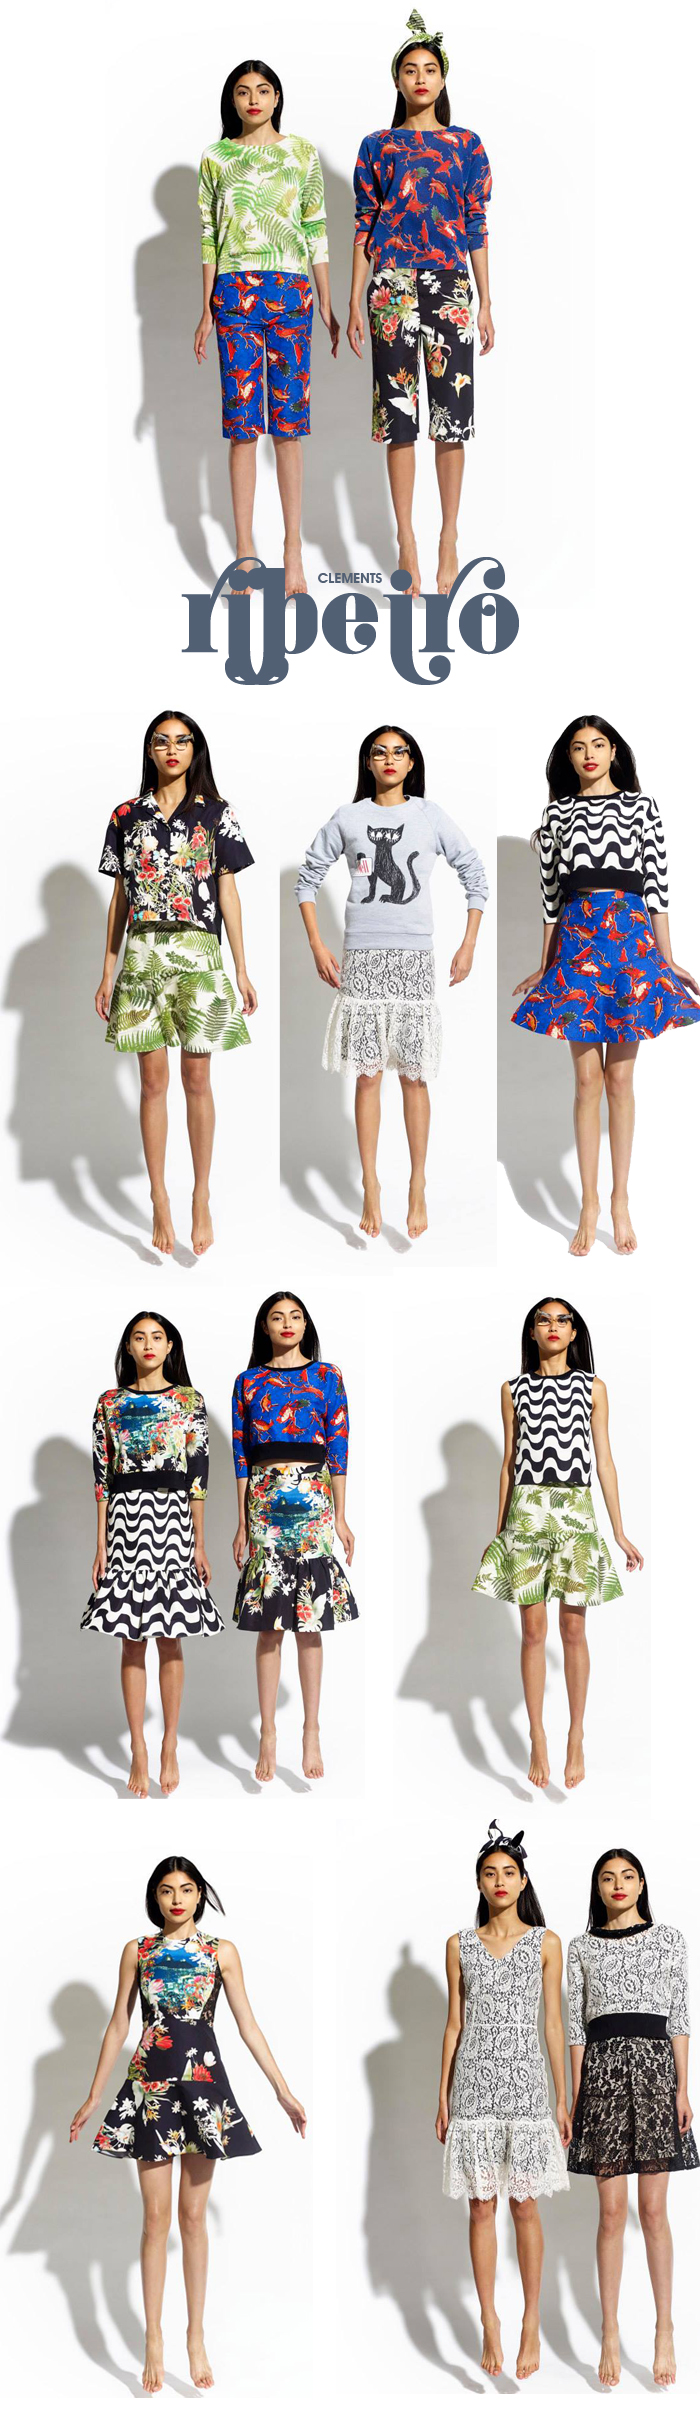 Clements Ribeiro Primavera verão 2014 Fashion blog meninait